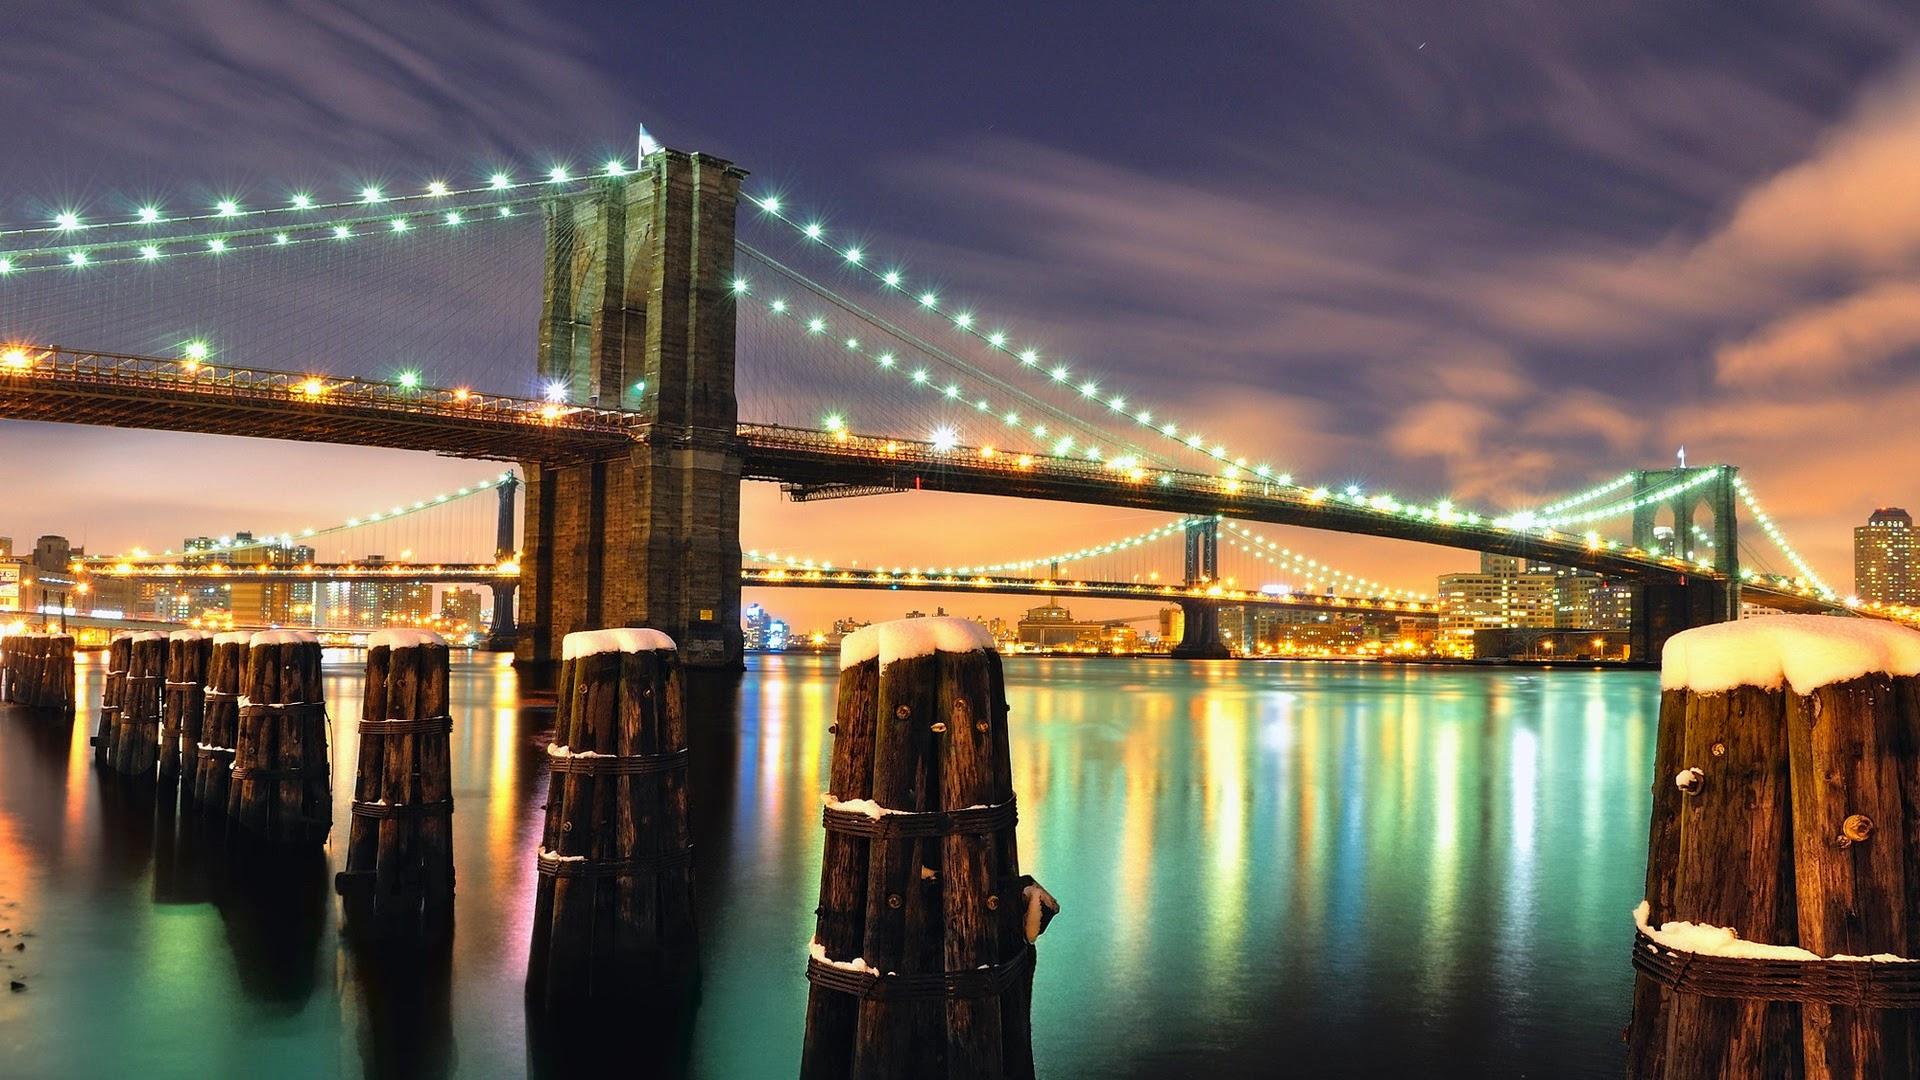 brooklyn bridge new york city full hd desktop wallpapers 1080p. Black Bedroom Furniture Sets. Home Design Ideas